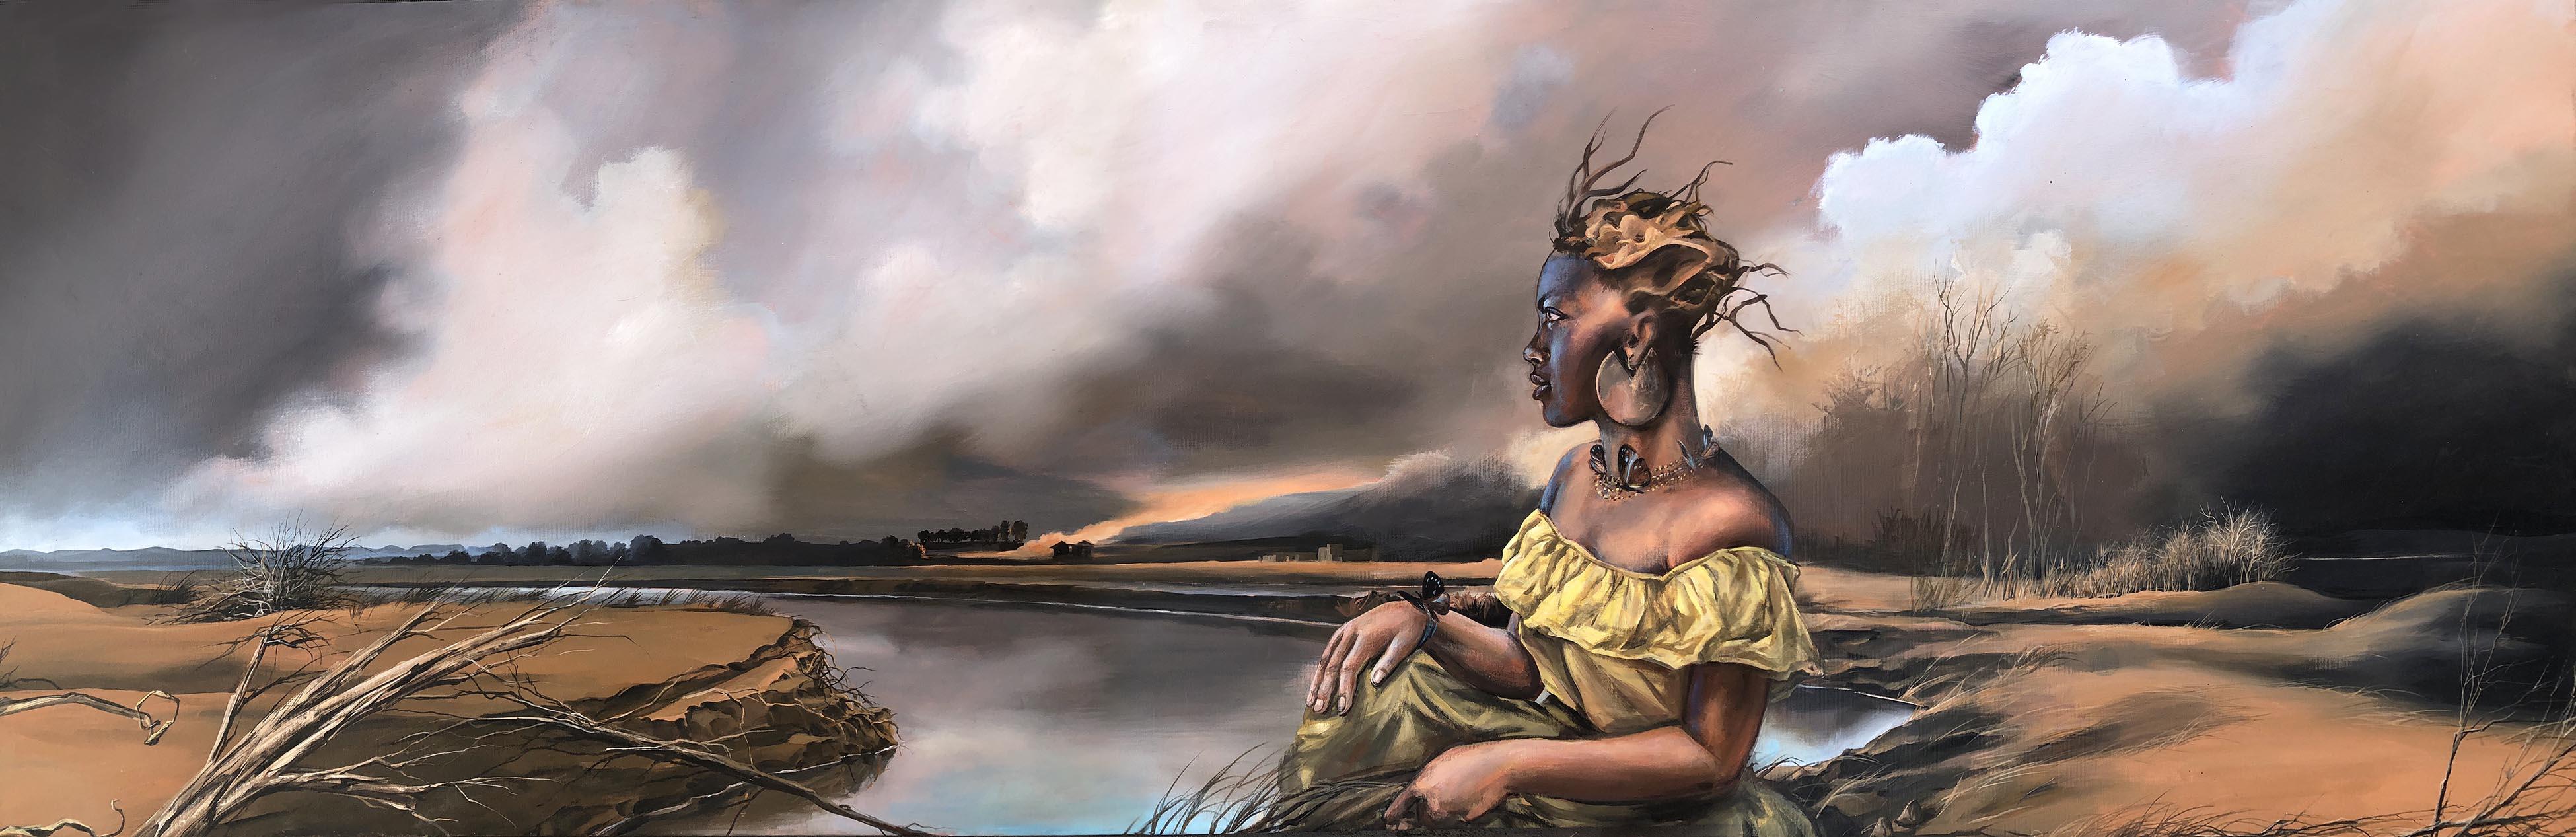 River Priestess